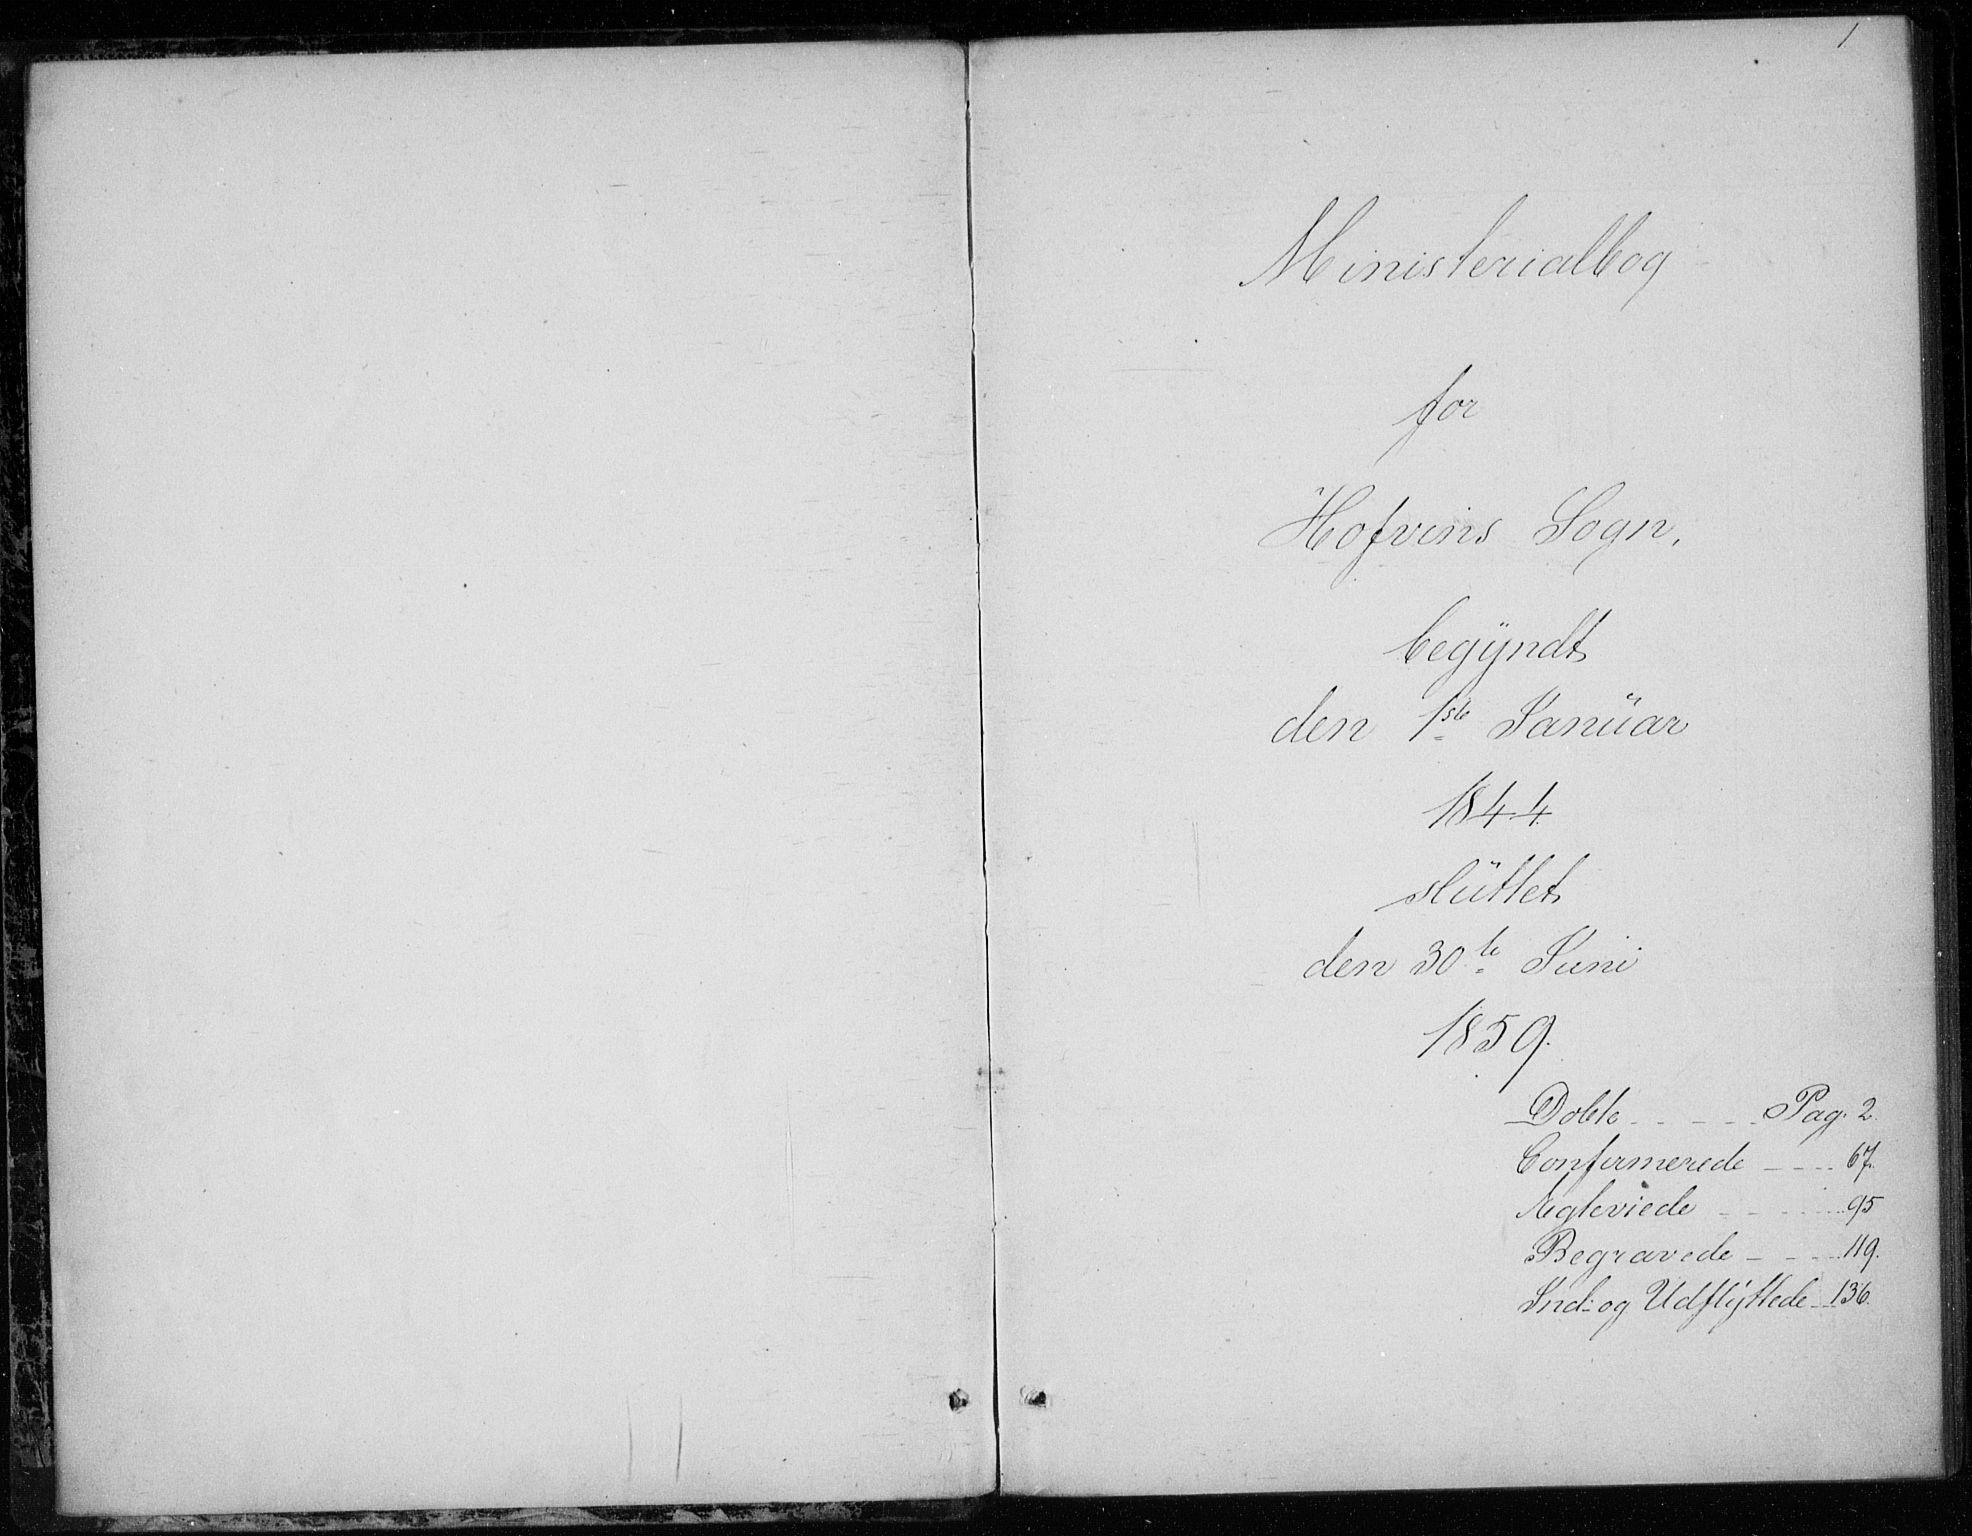 SAKO, Gransherad kirkebøker, F/Fb/L0003: Ministerialbok nr. II 3, 1844-1859, s. 1